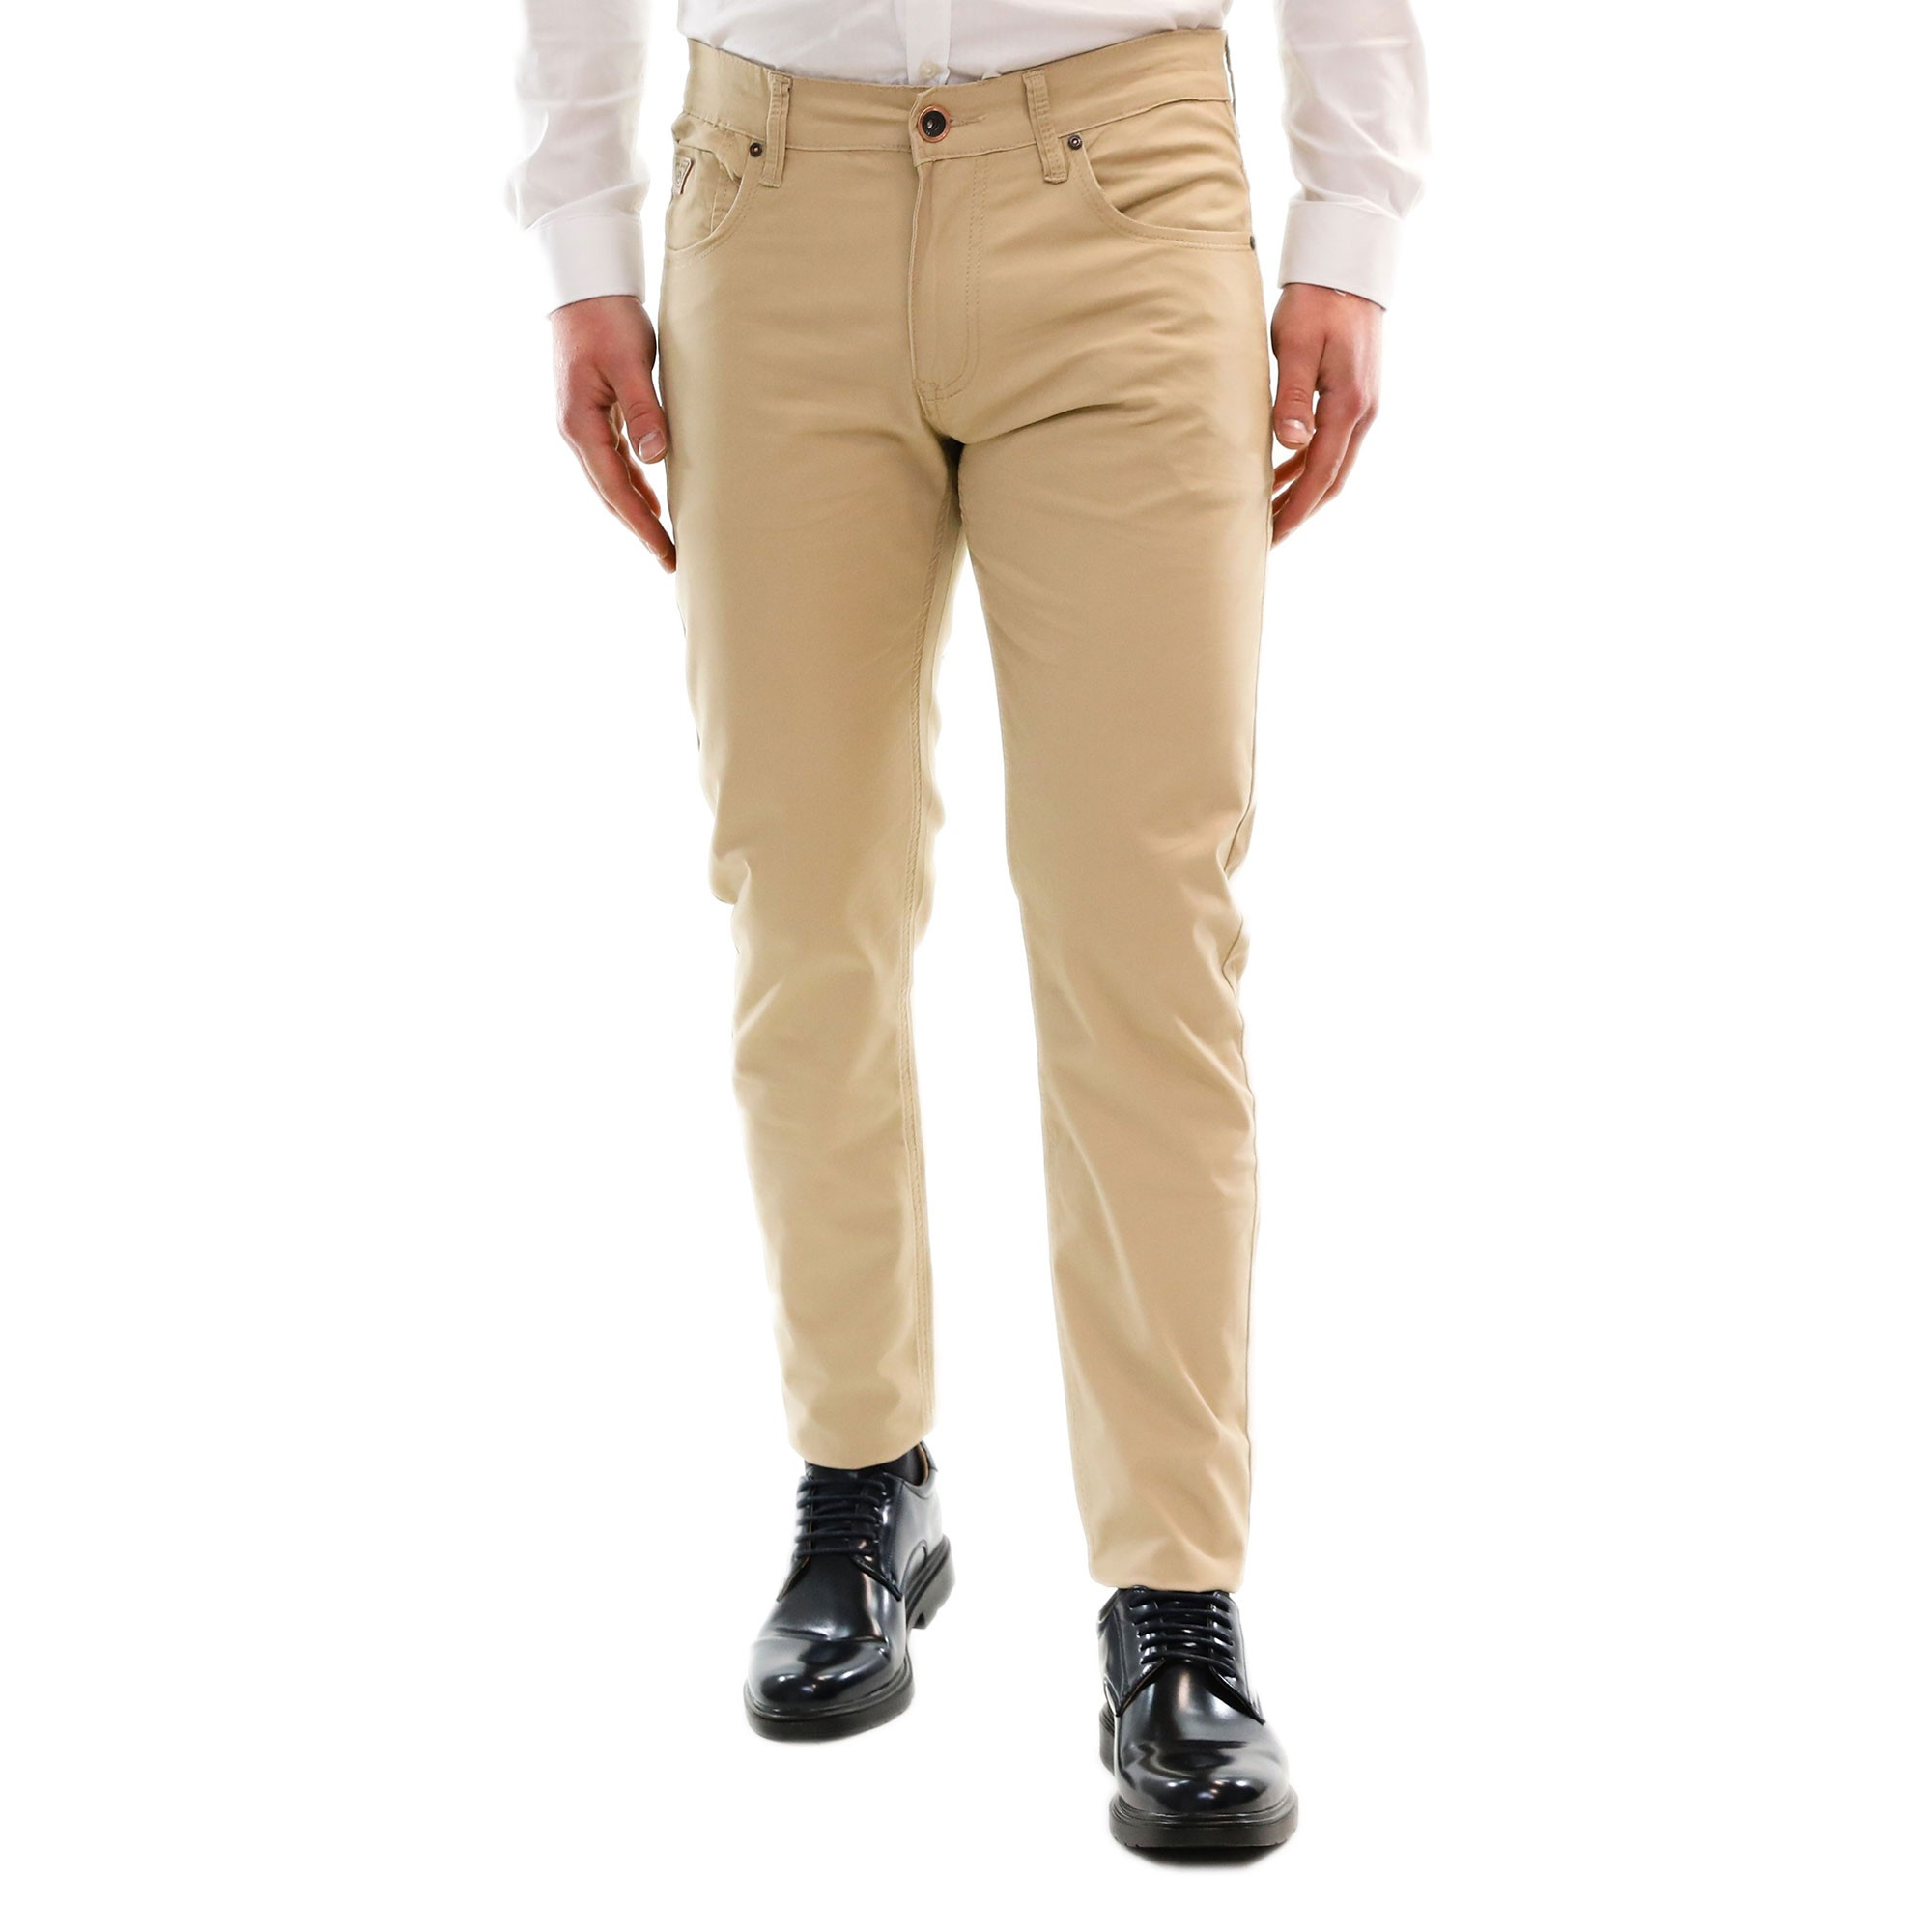 097b8c00d6 Pantalone Uomo Cotone Estivo Leggero Chino Slim Casual Elegante 5 ...